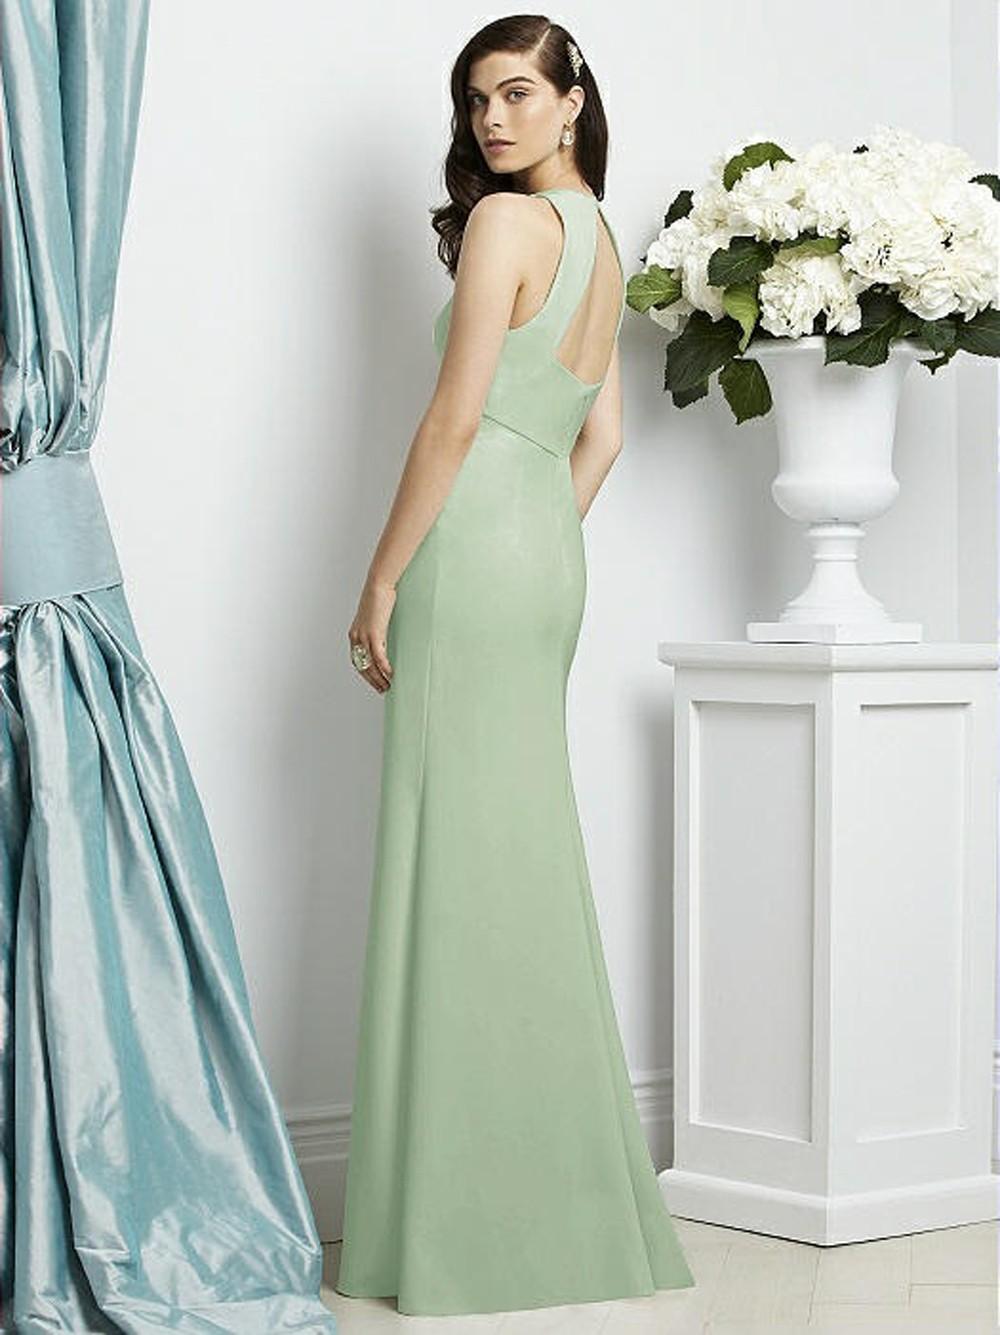 quick delivery wedding dresses photo - 1